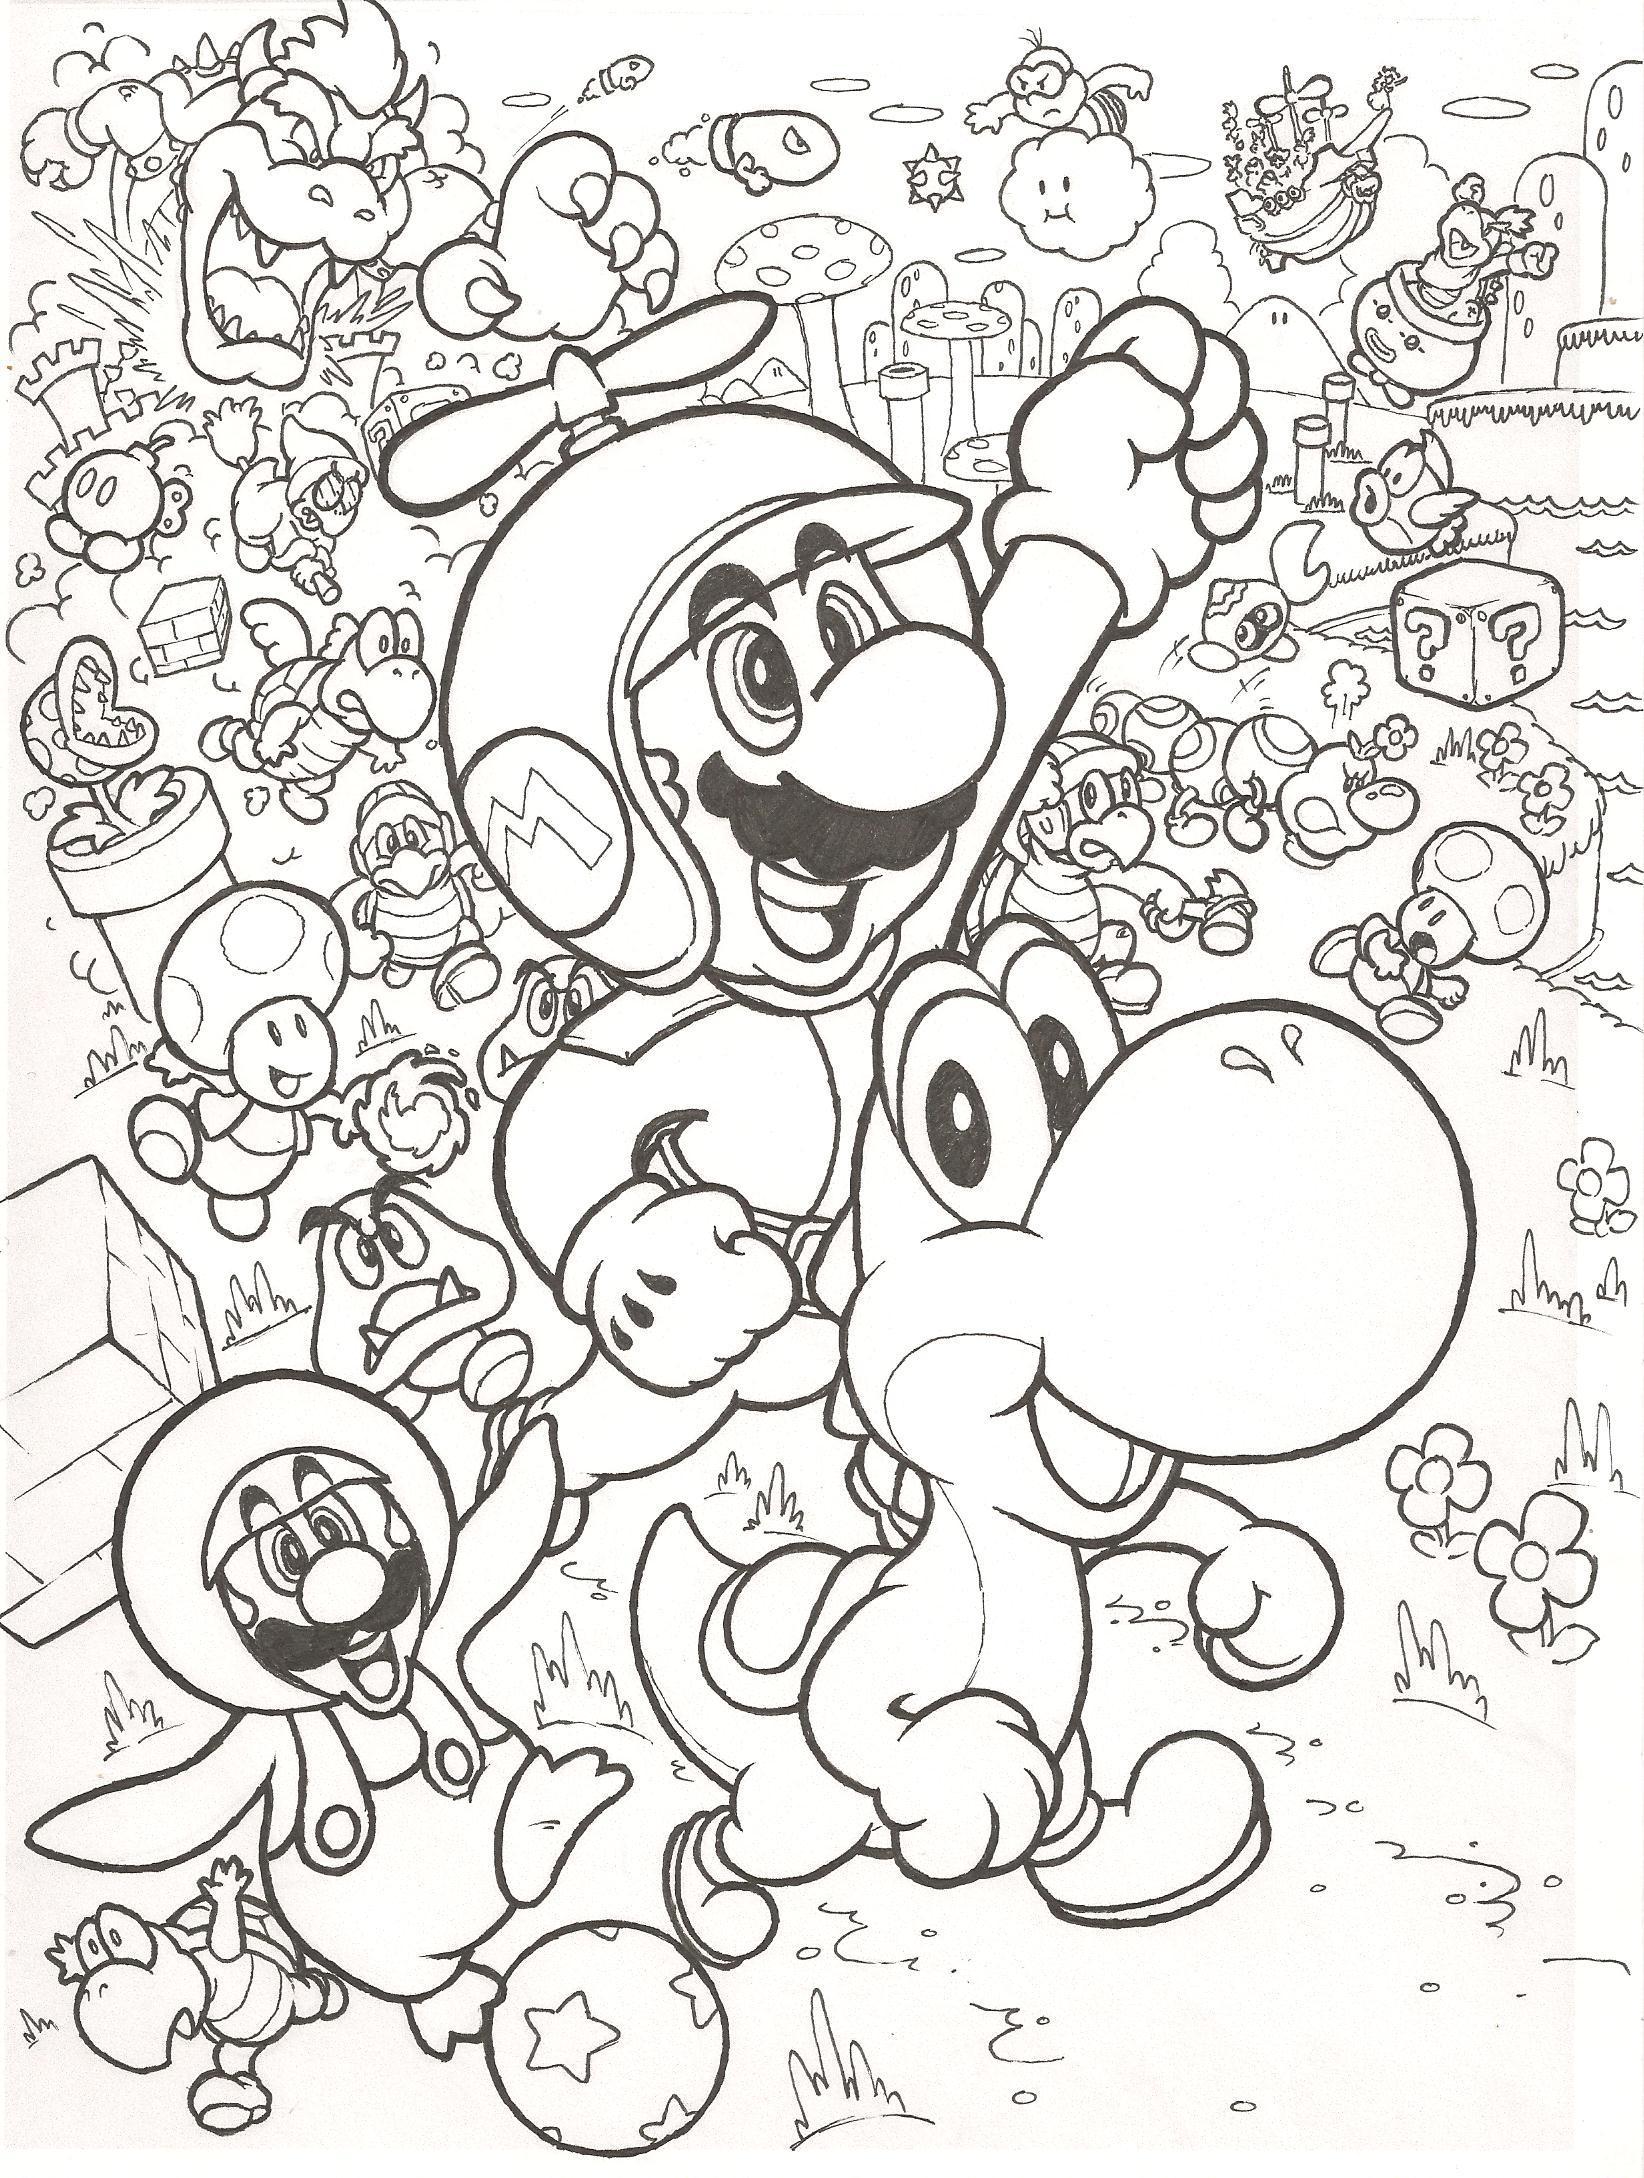 1644x2178 Super Mario Bros Wii Coloring Pages